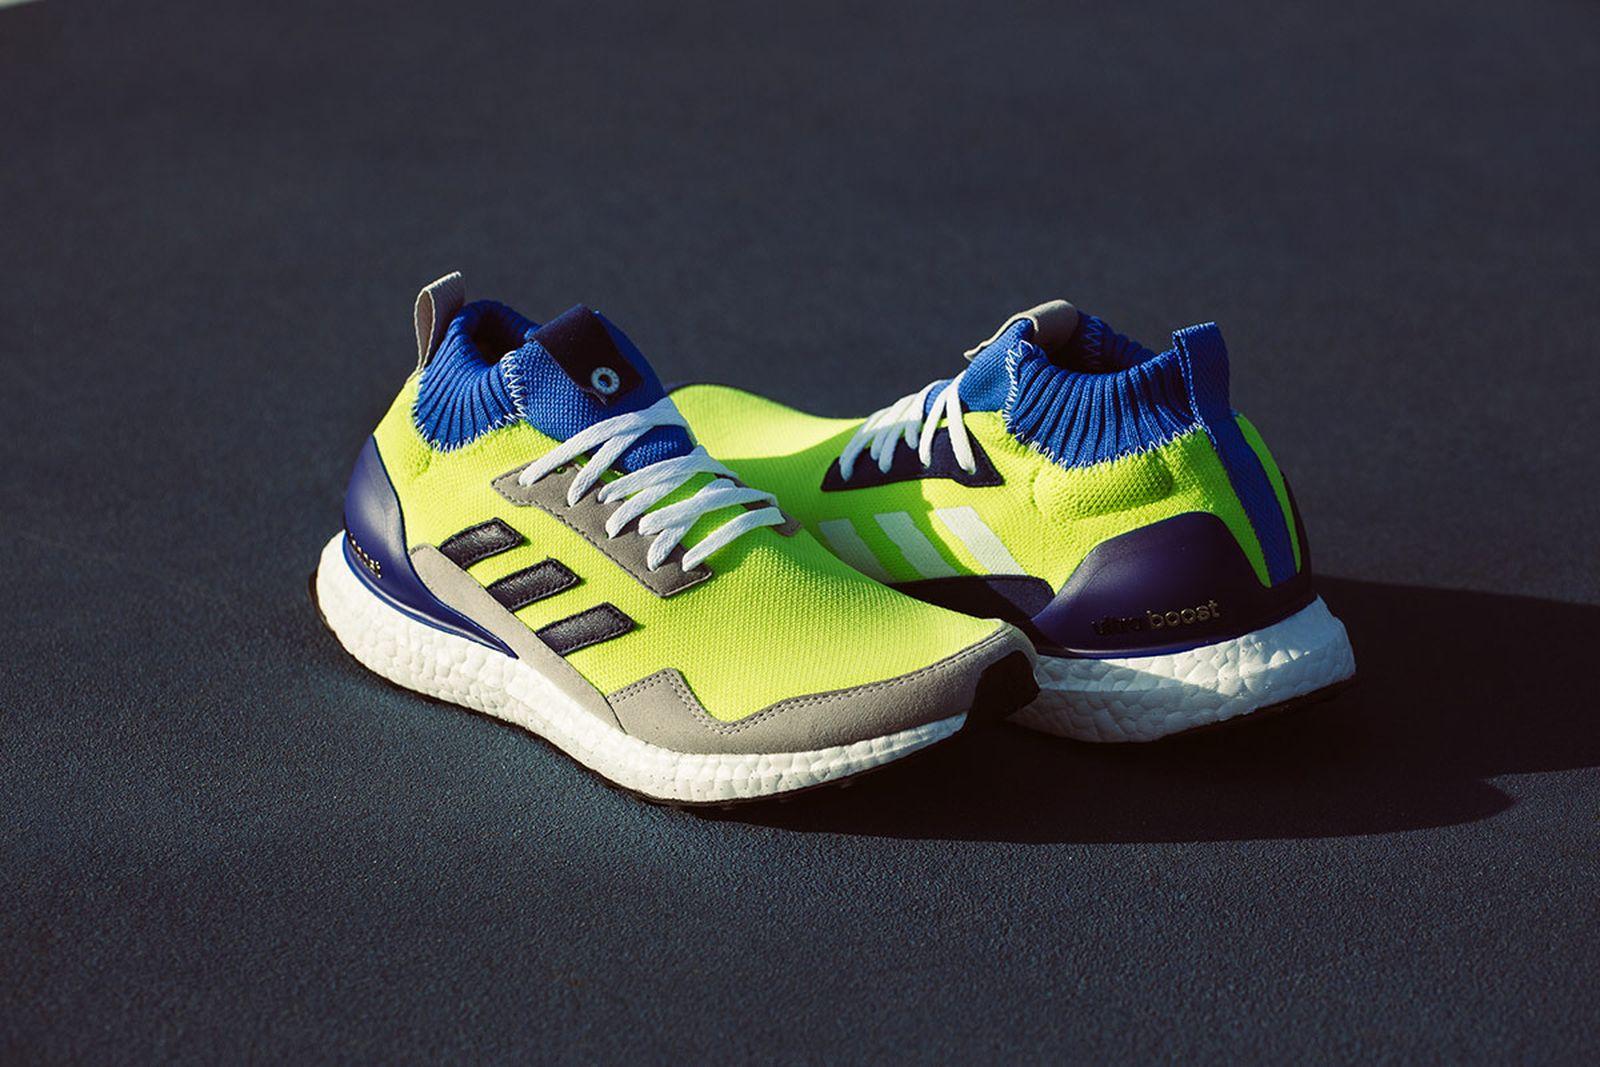 adidas-consortium-ultraboost-mid-prototype-release-date-price-01